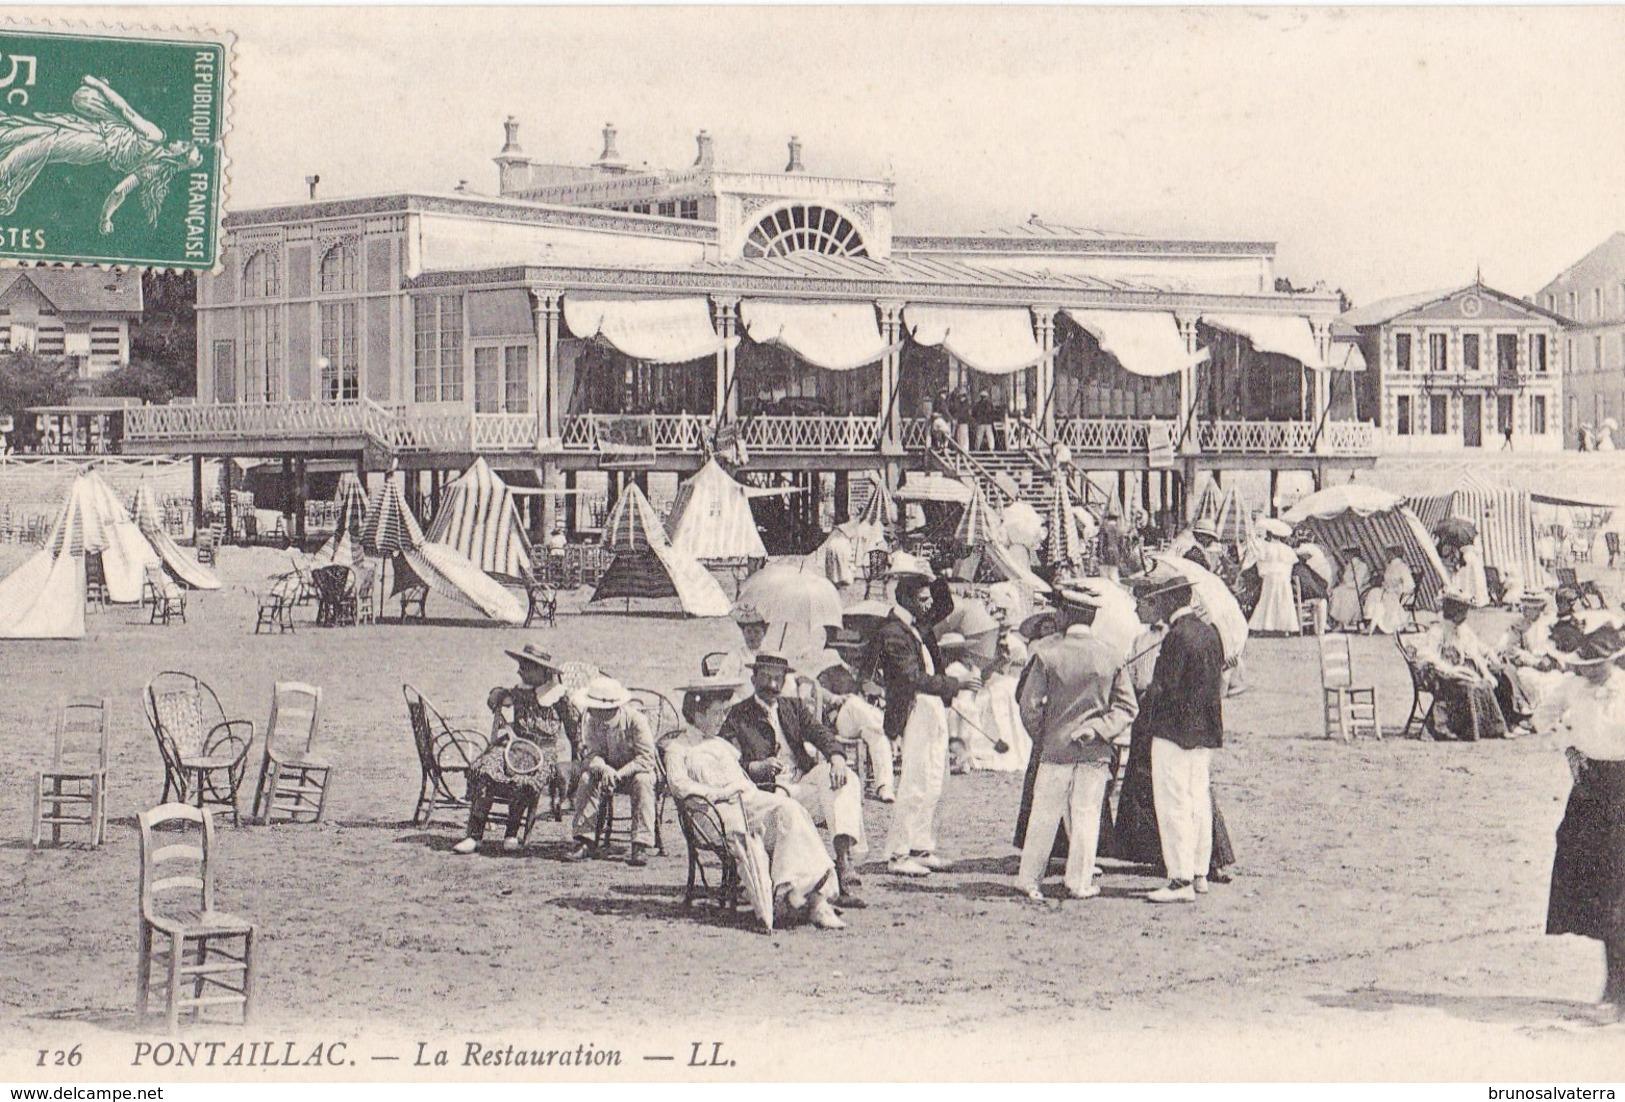 PONTAILLAC - La Restauration - France